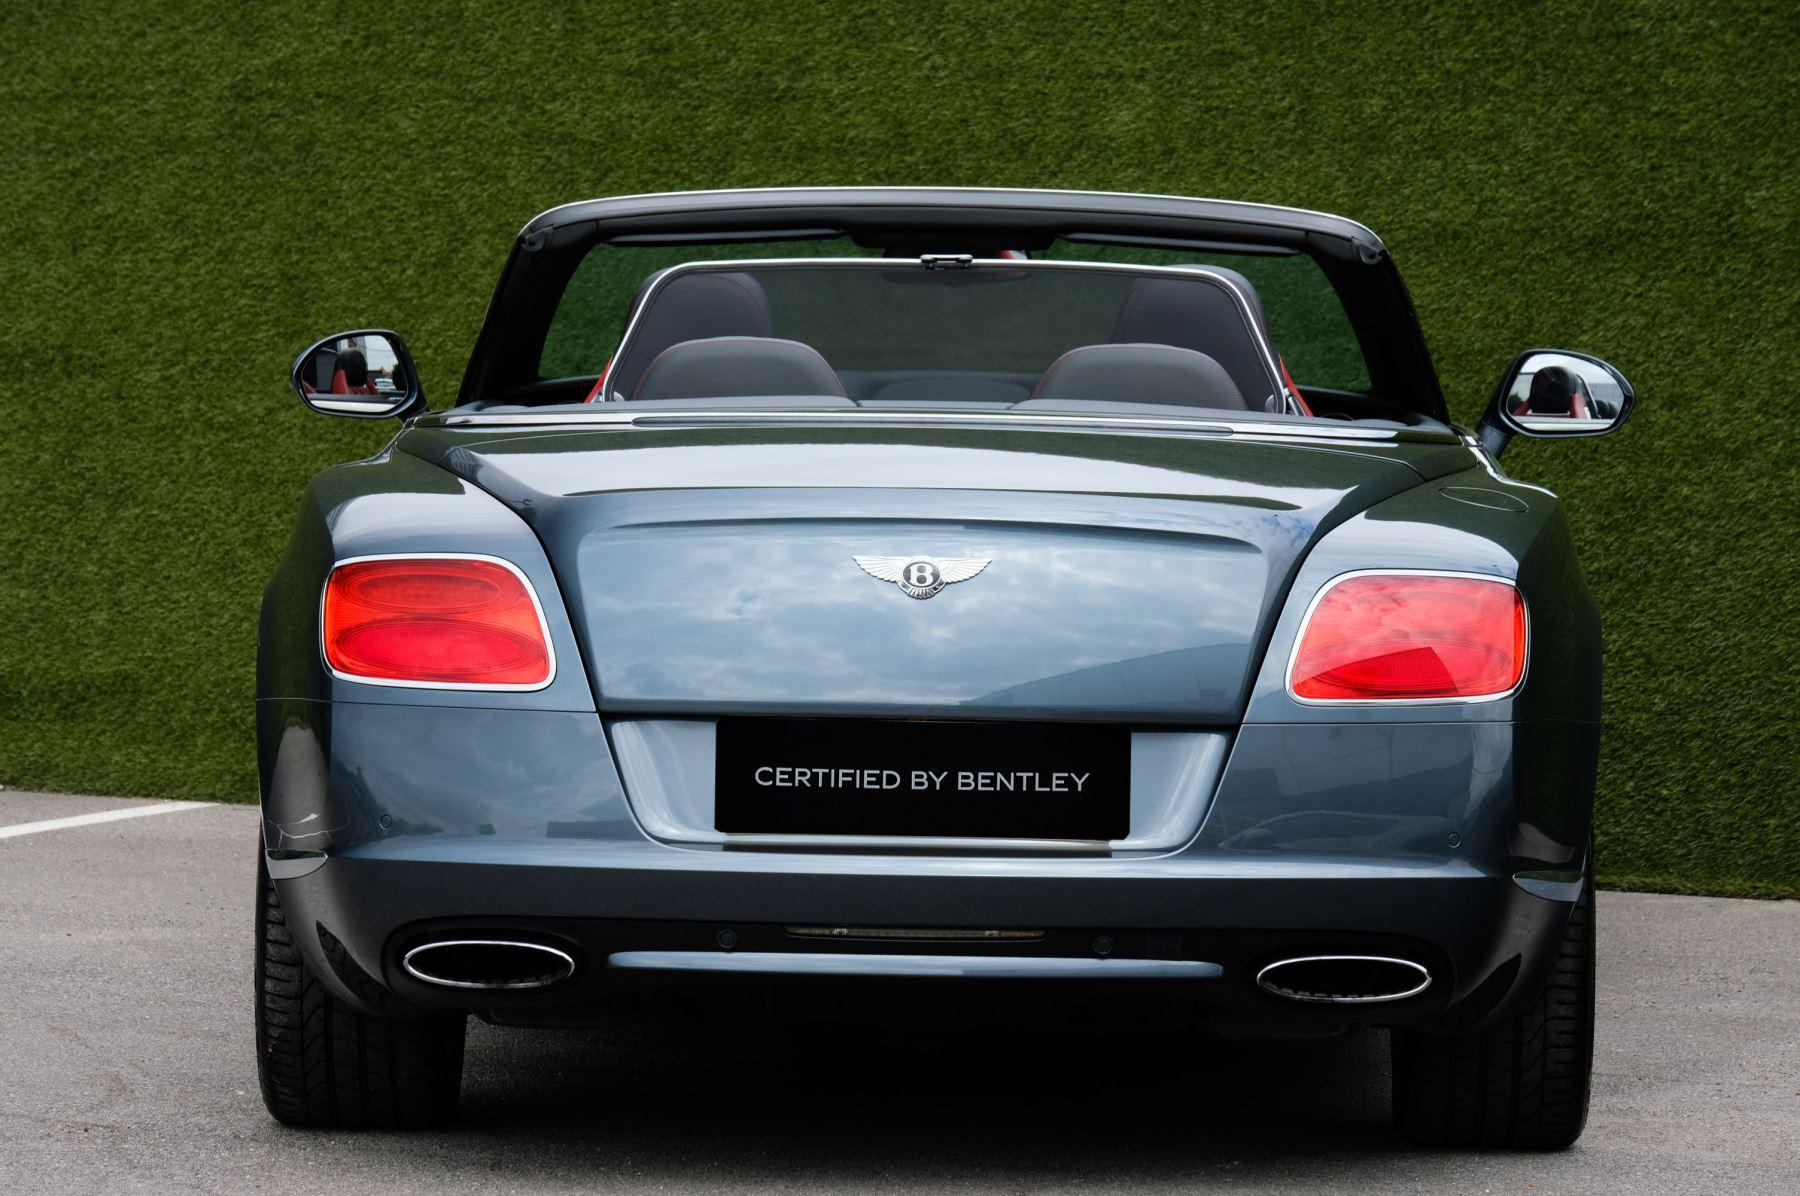 Bentley Continental GTC 6.0 W12 Speed - Massage Seats & Ventilation - Neck Warmer - Rear View Camera image 4